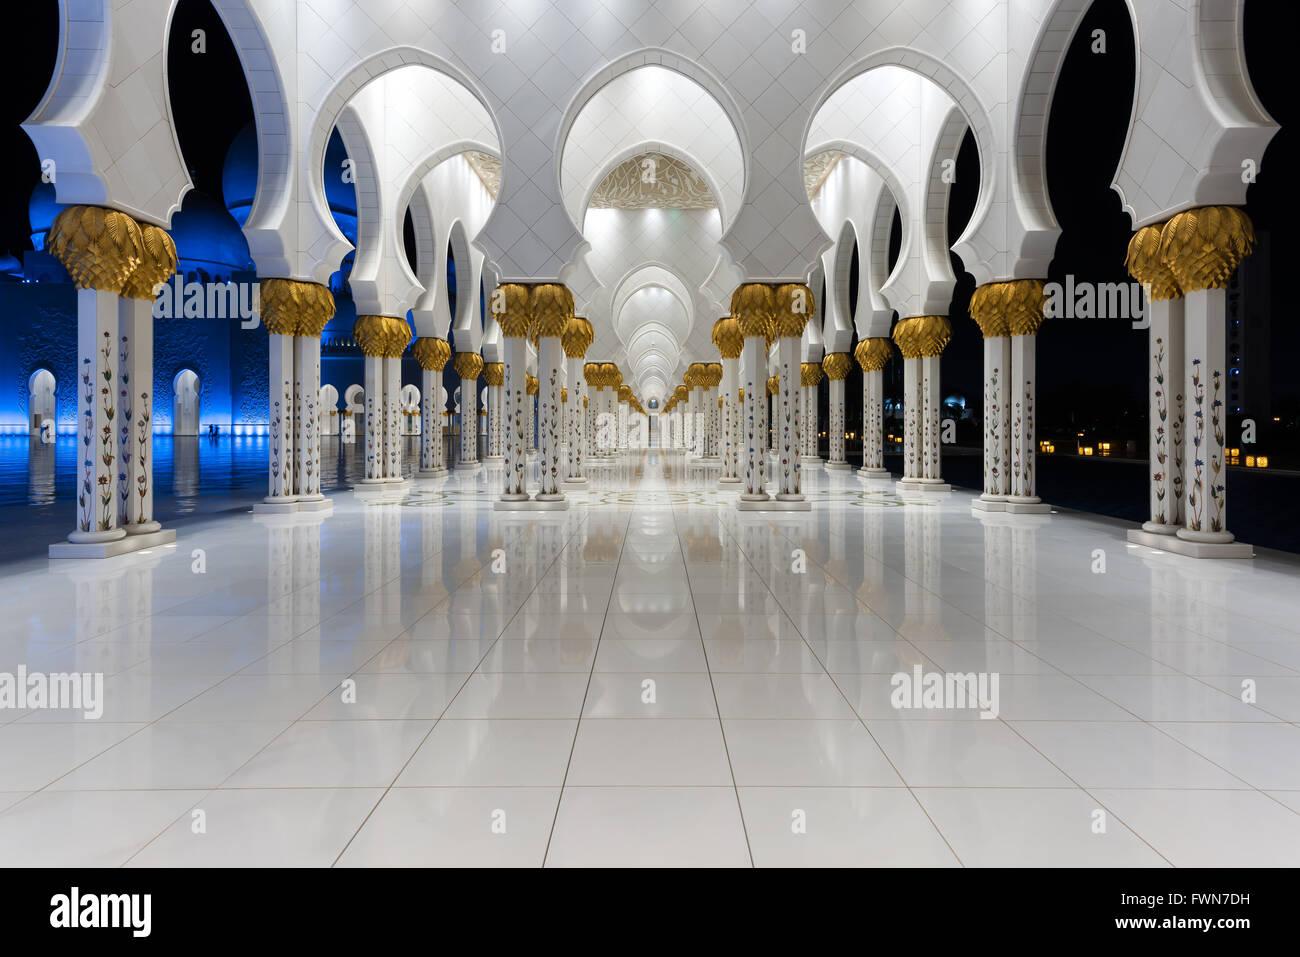 Equilibrium - Sheikh Zayed Grand Mosque, Abu Dhabi - Stock Image